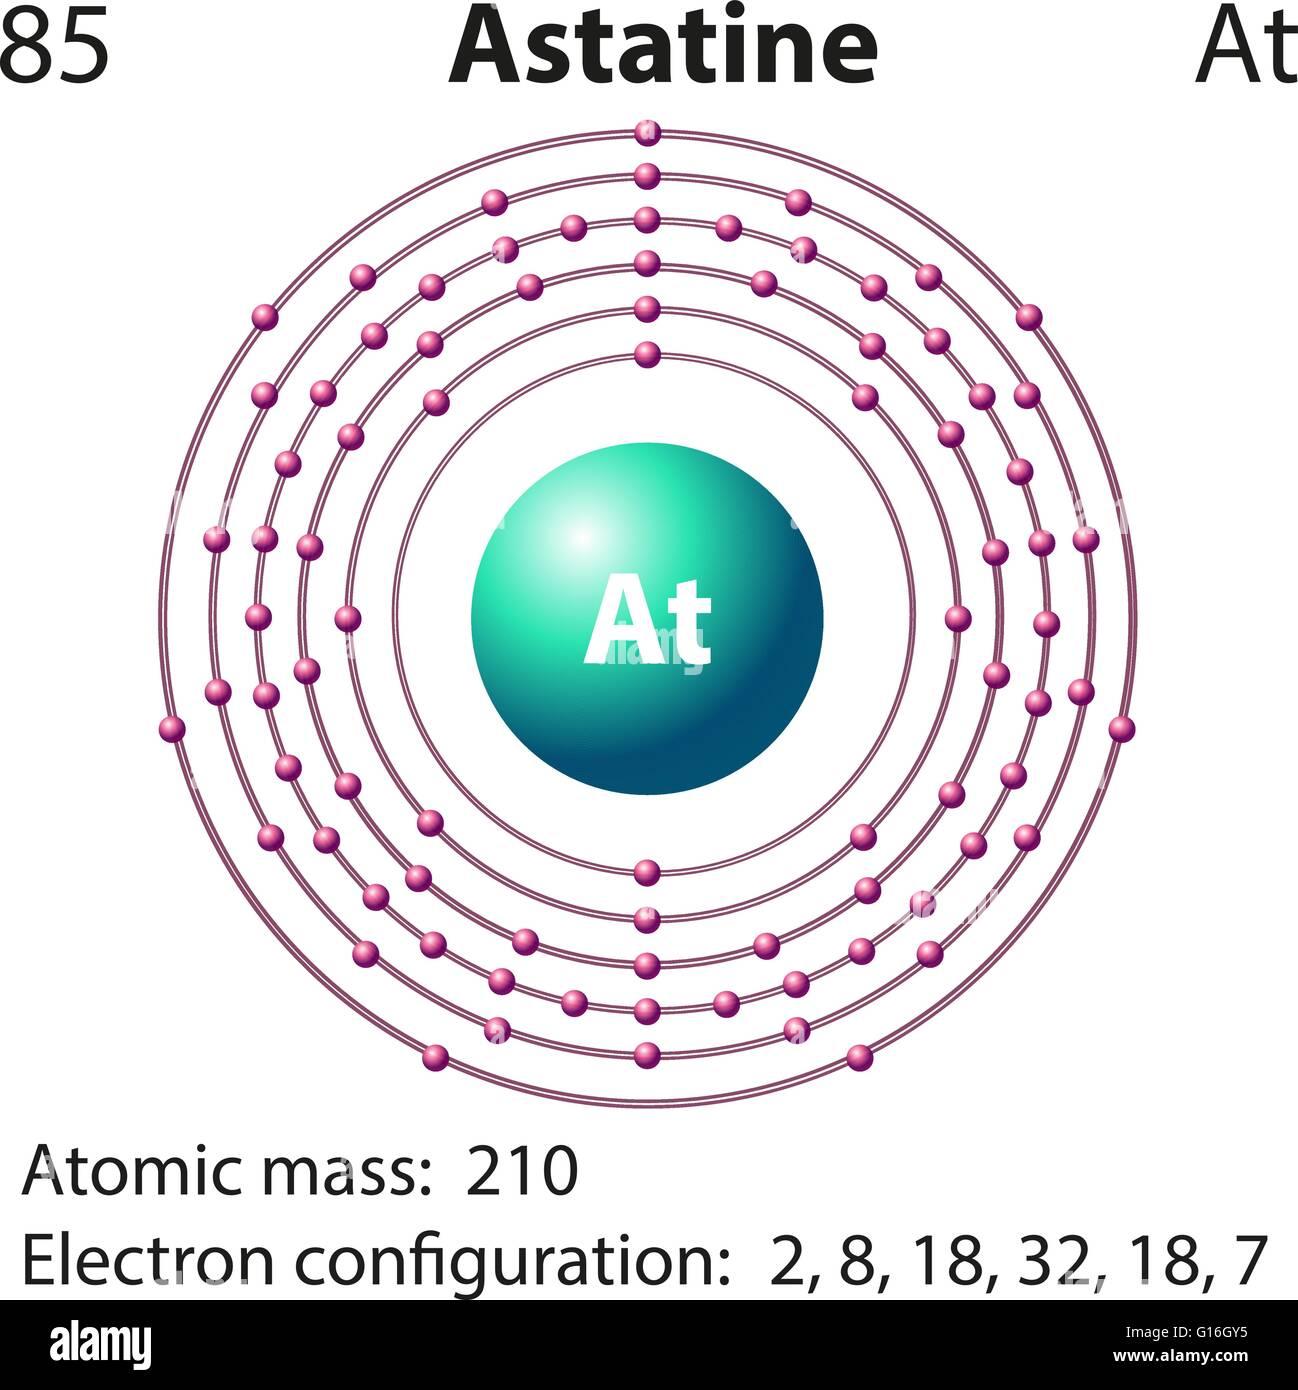 hight resolution of diagram representation of the element astatine illustration stock image